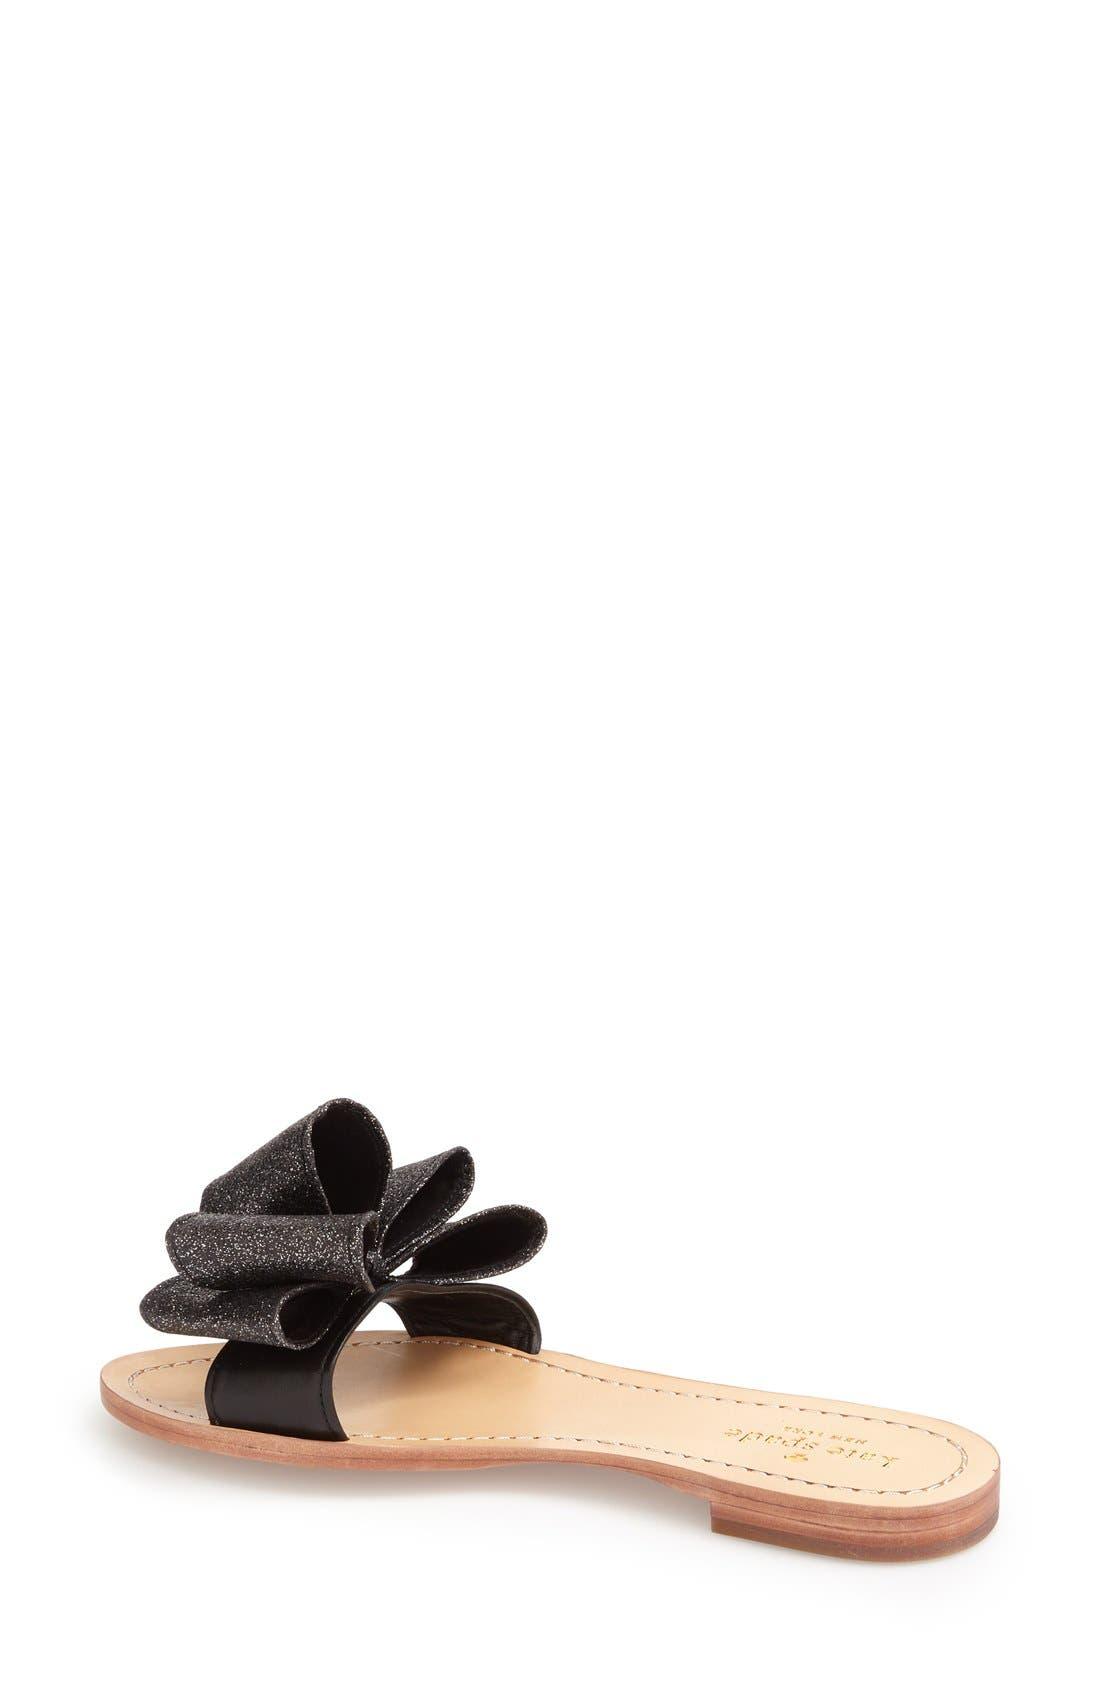 KATE SPADE NEW YORK, 'cicely' sandal, Alternate thumbnail 2, color, 006